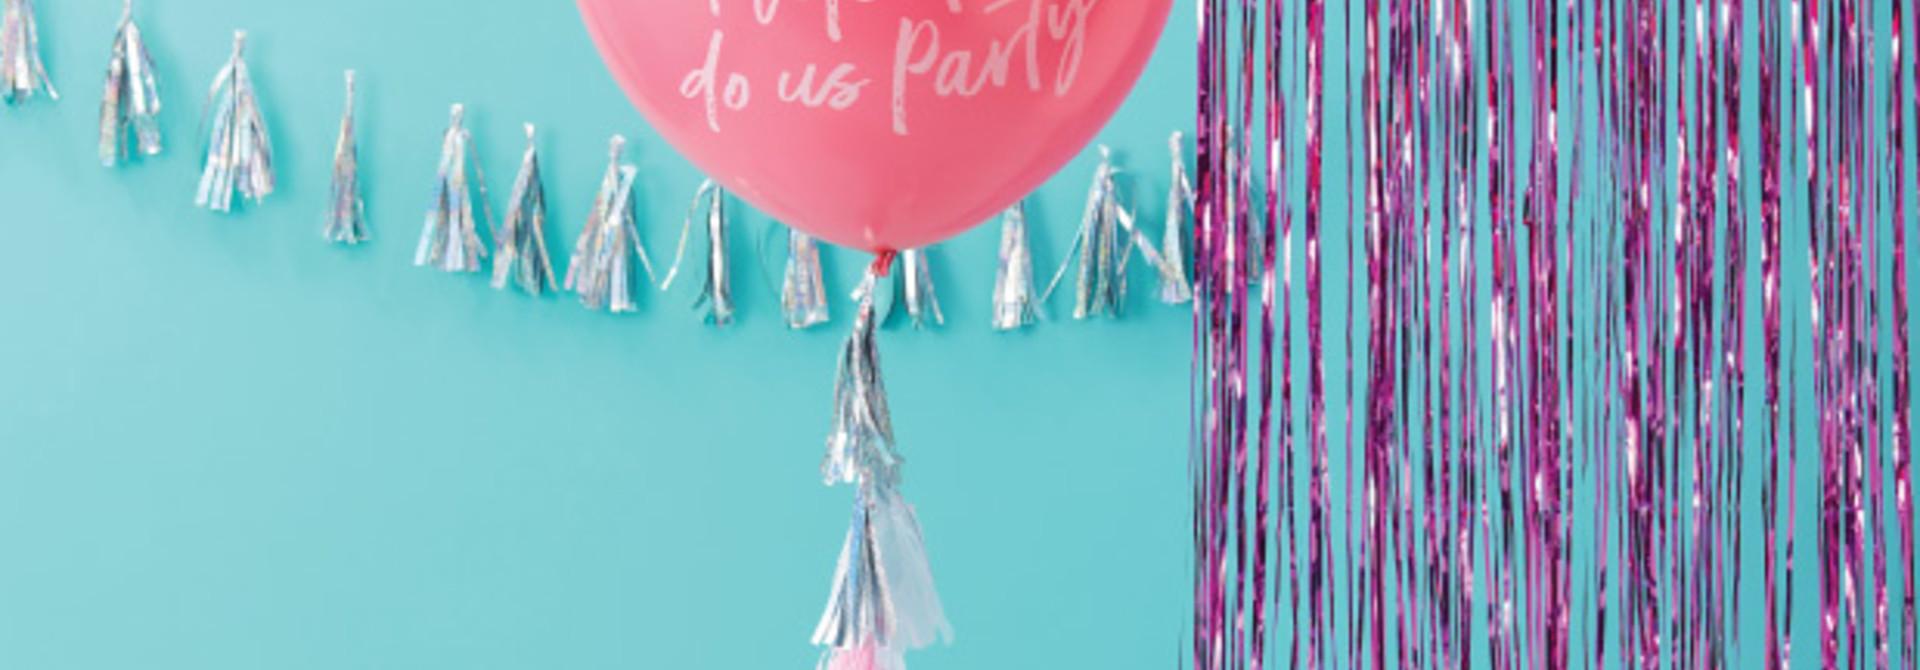 Till death do us party ballon kit - Ginger Ray